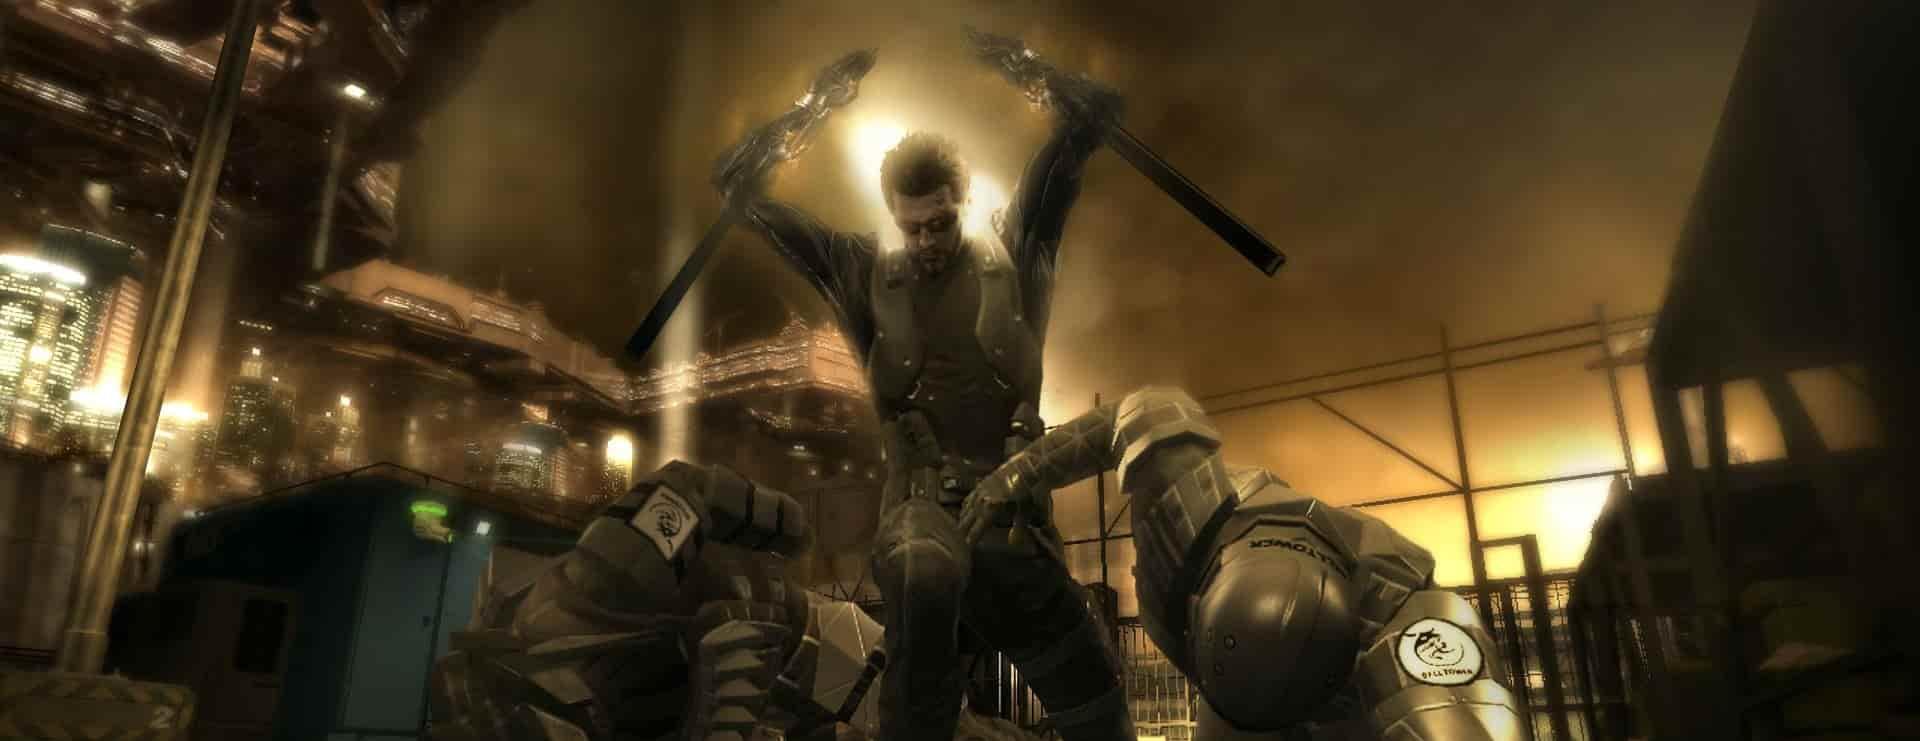 deus ex human revolution combat gameplay